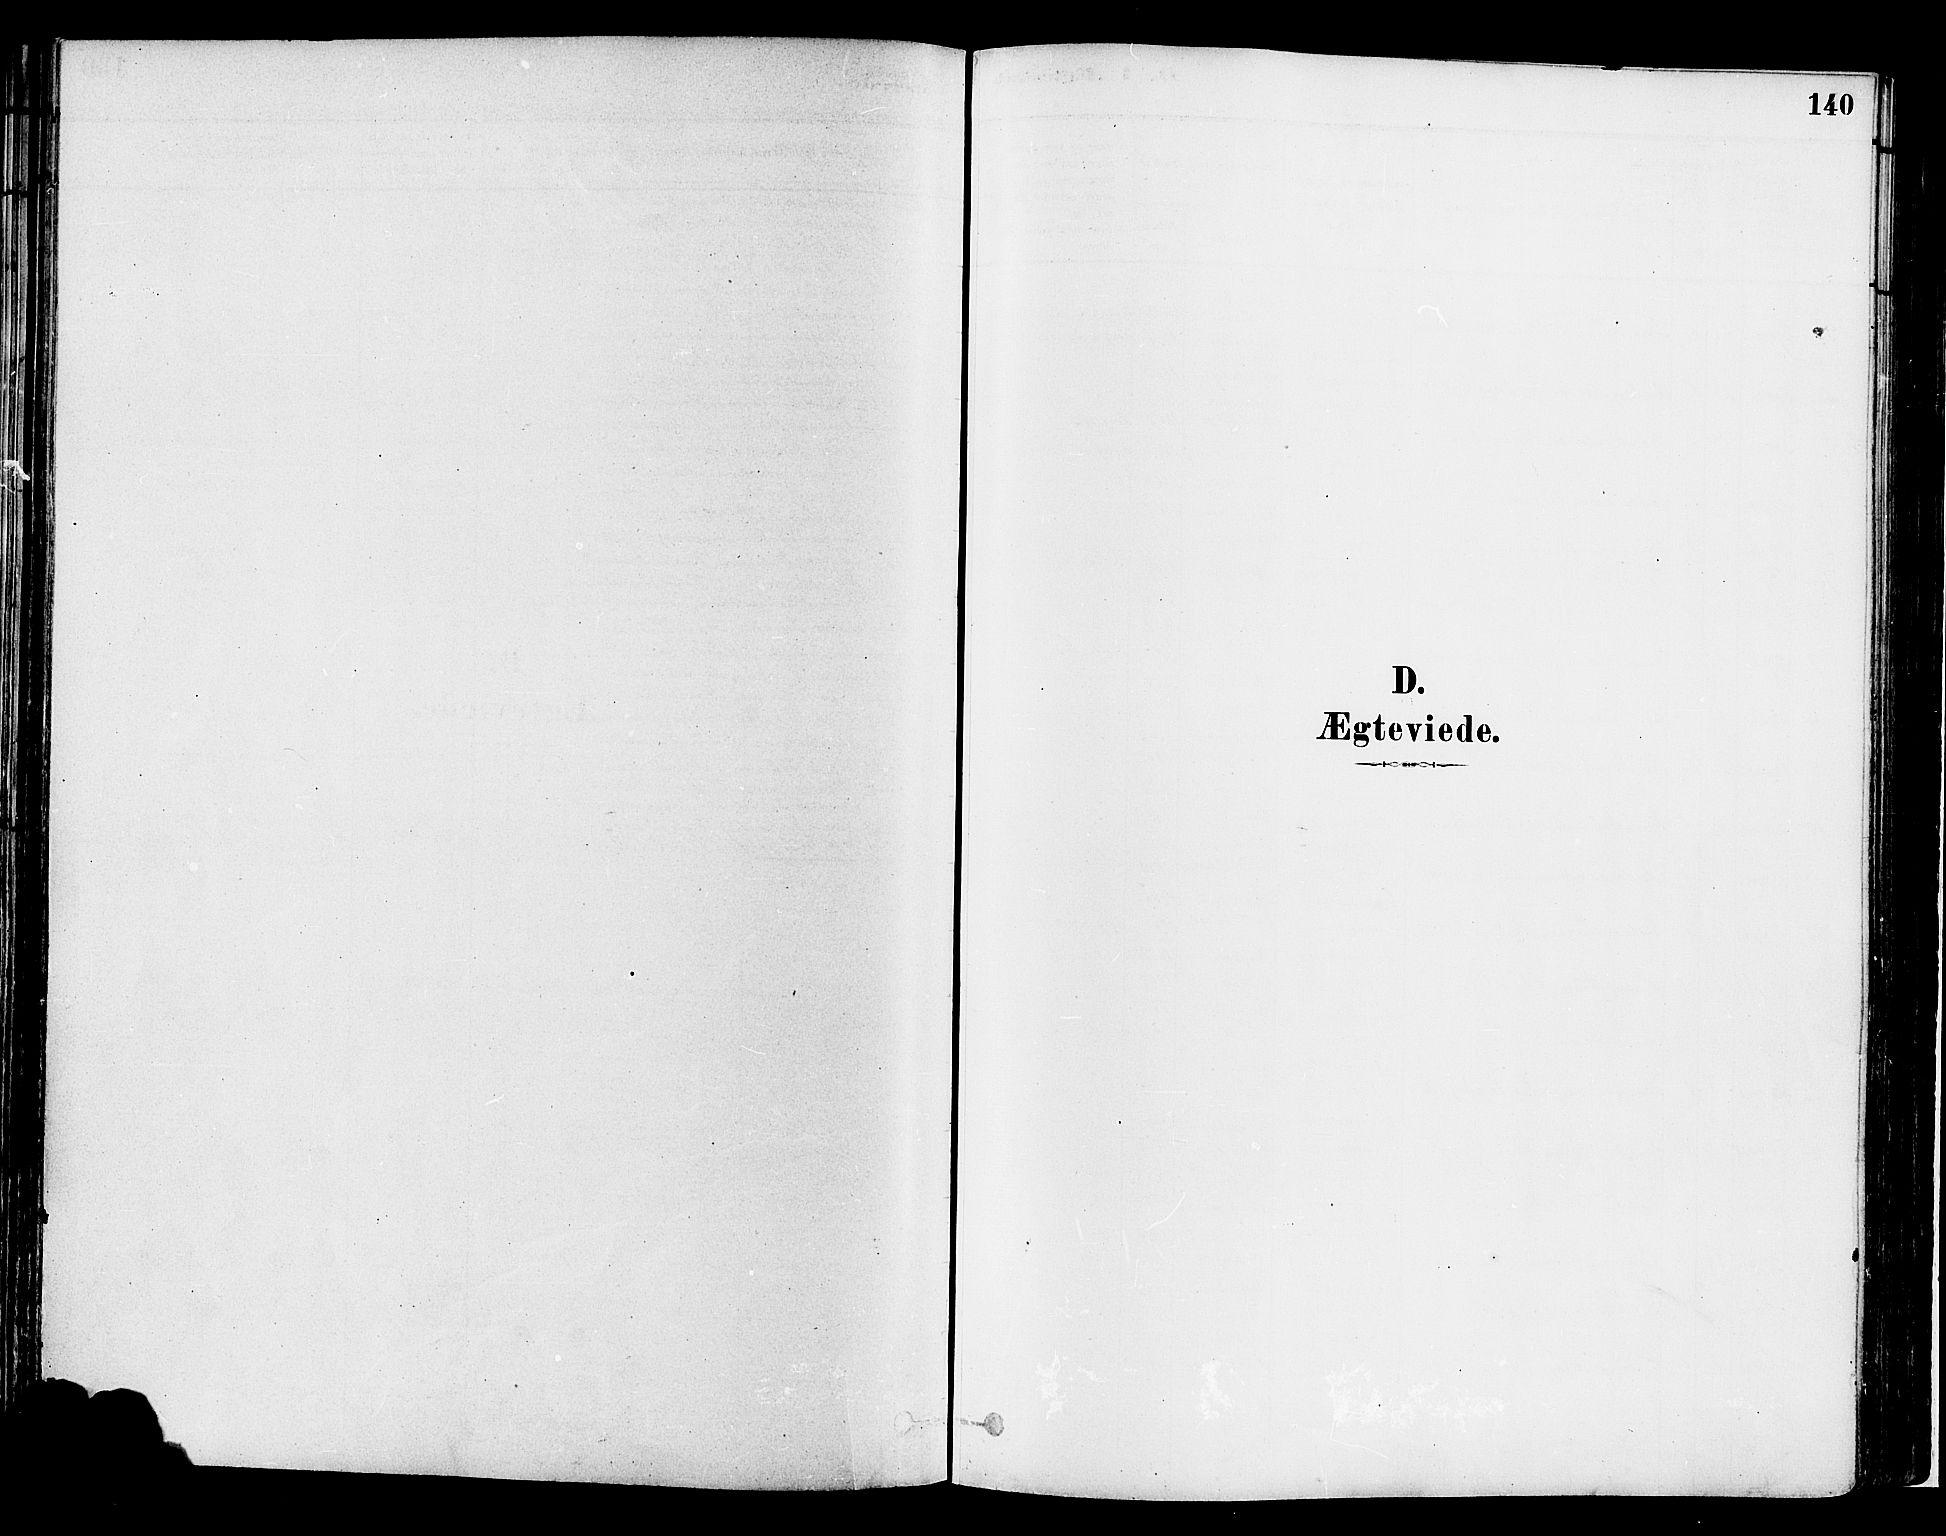 SAH, Gran prestekontor, Ministerialbok nr. 14, 1880-1889, s. 140